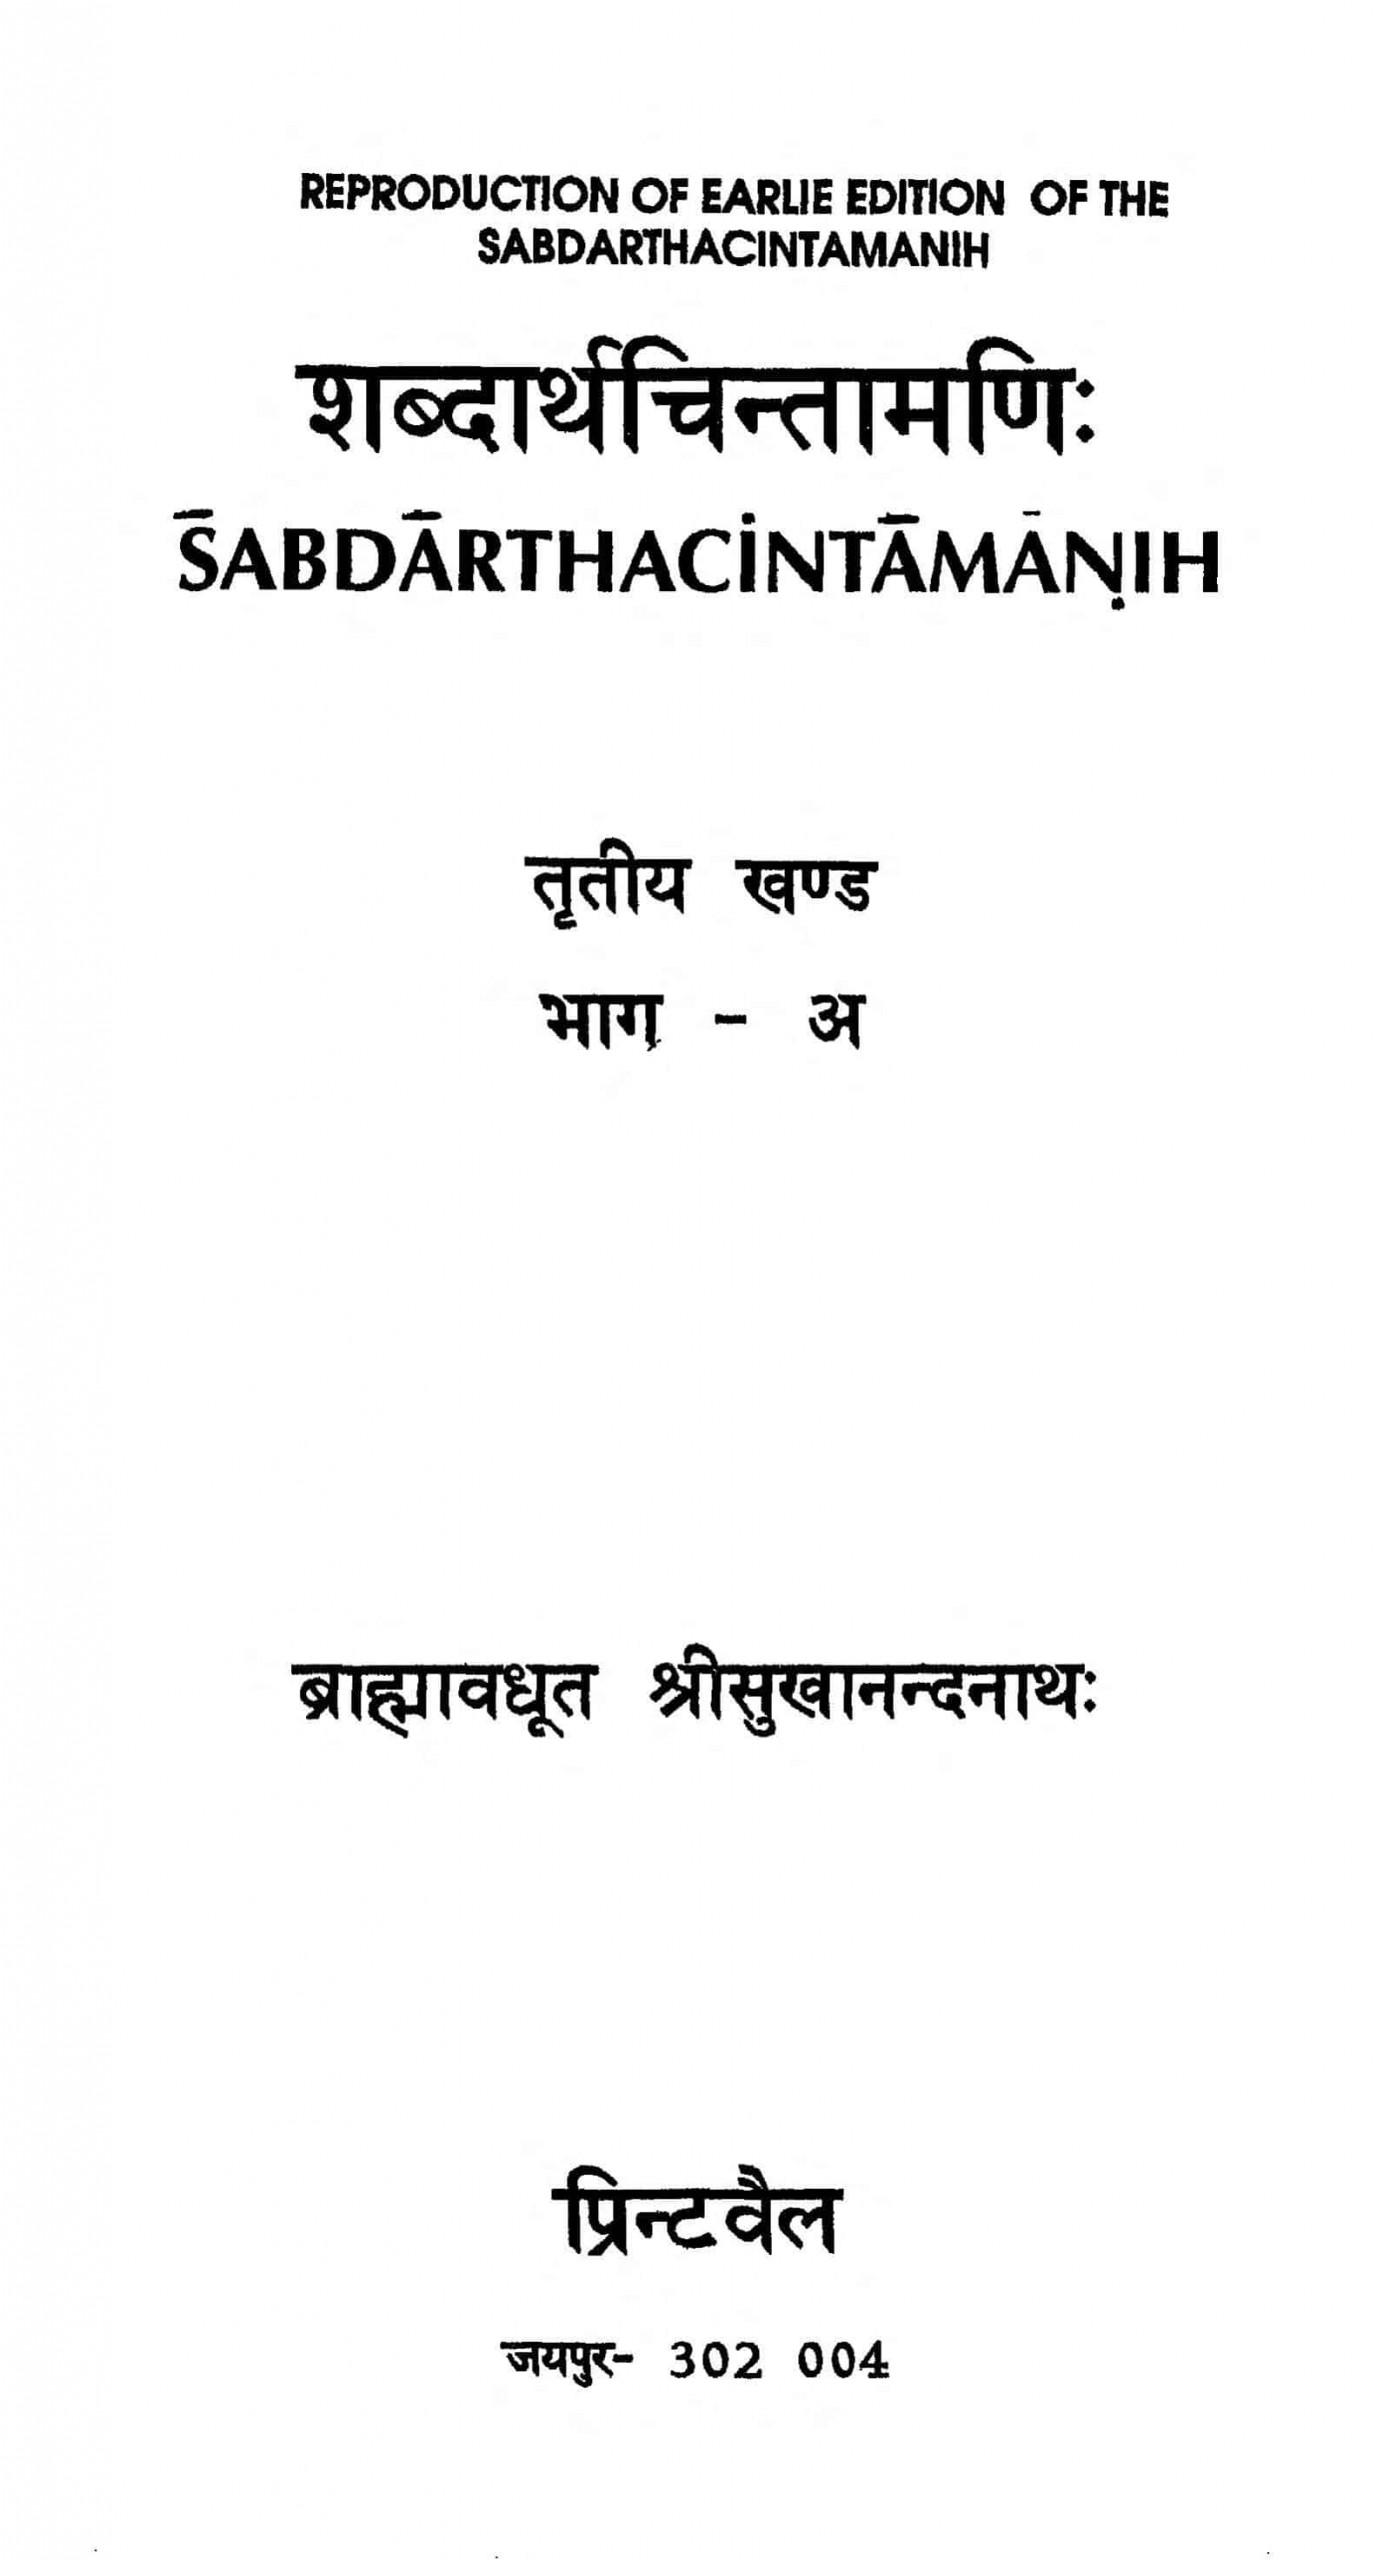 Book Image : शब्दार्थचिन्तामणि: तृतीय खण्ड - Shabdarthchintamani Khand 3